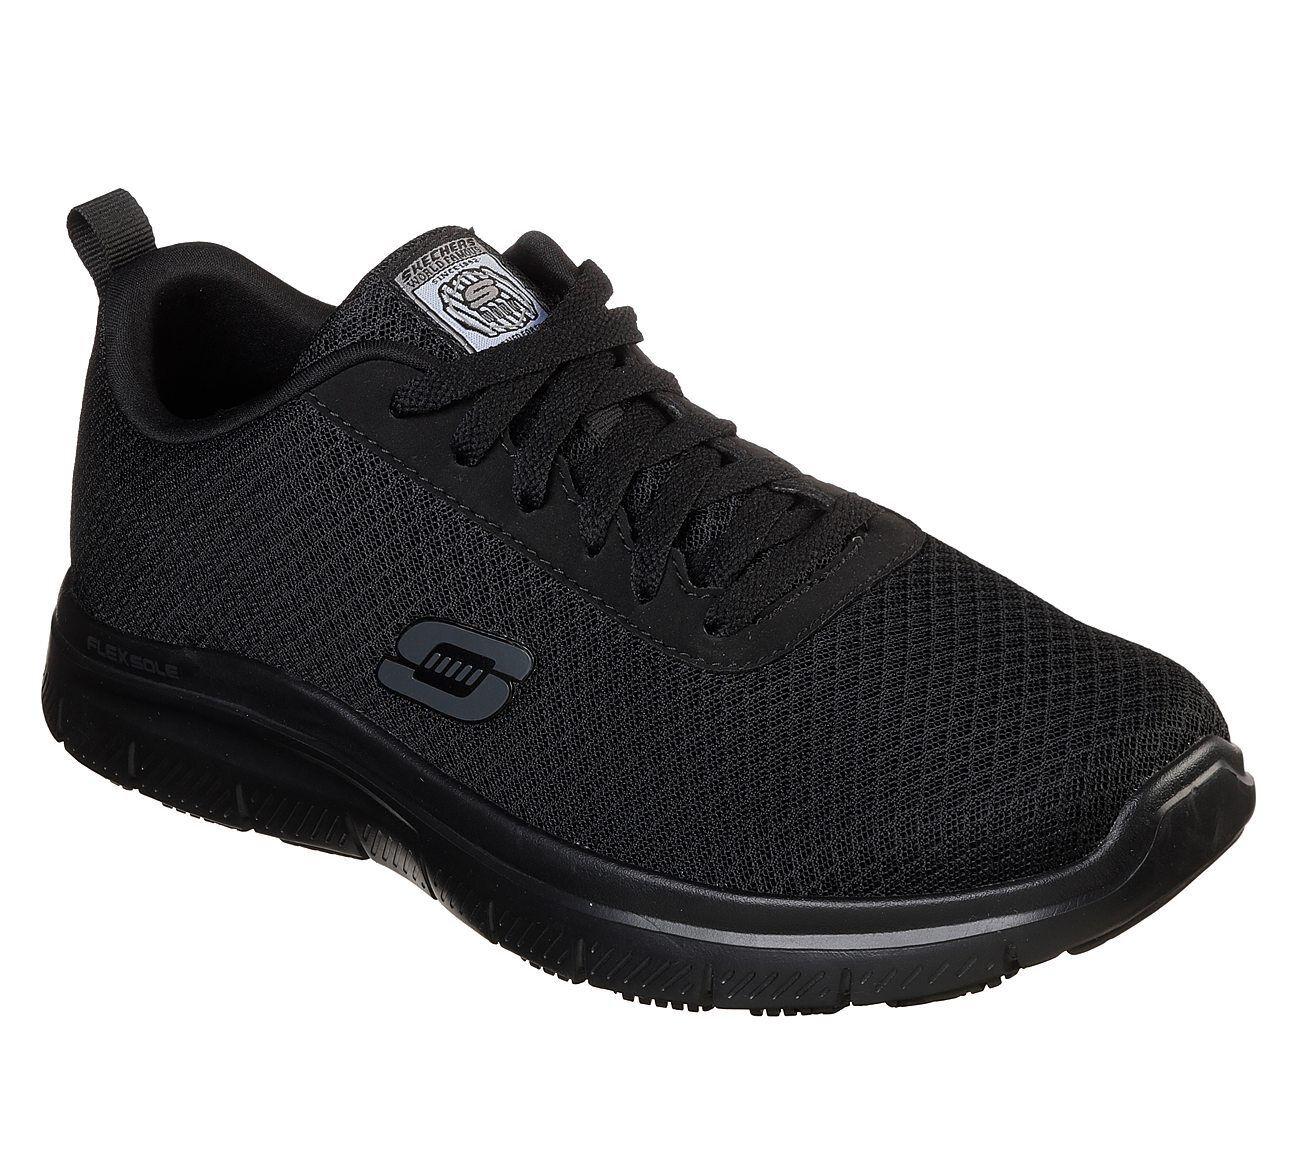 Skechers Work Relaxed Fit Flex Advantage - Bendon SR Shoes Mens Trainers  77125EC f8dda67bde0